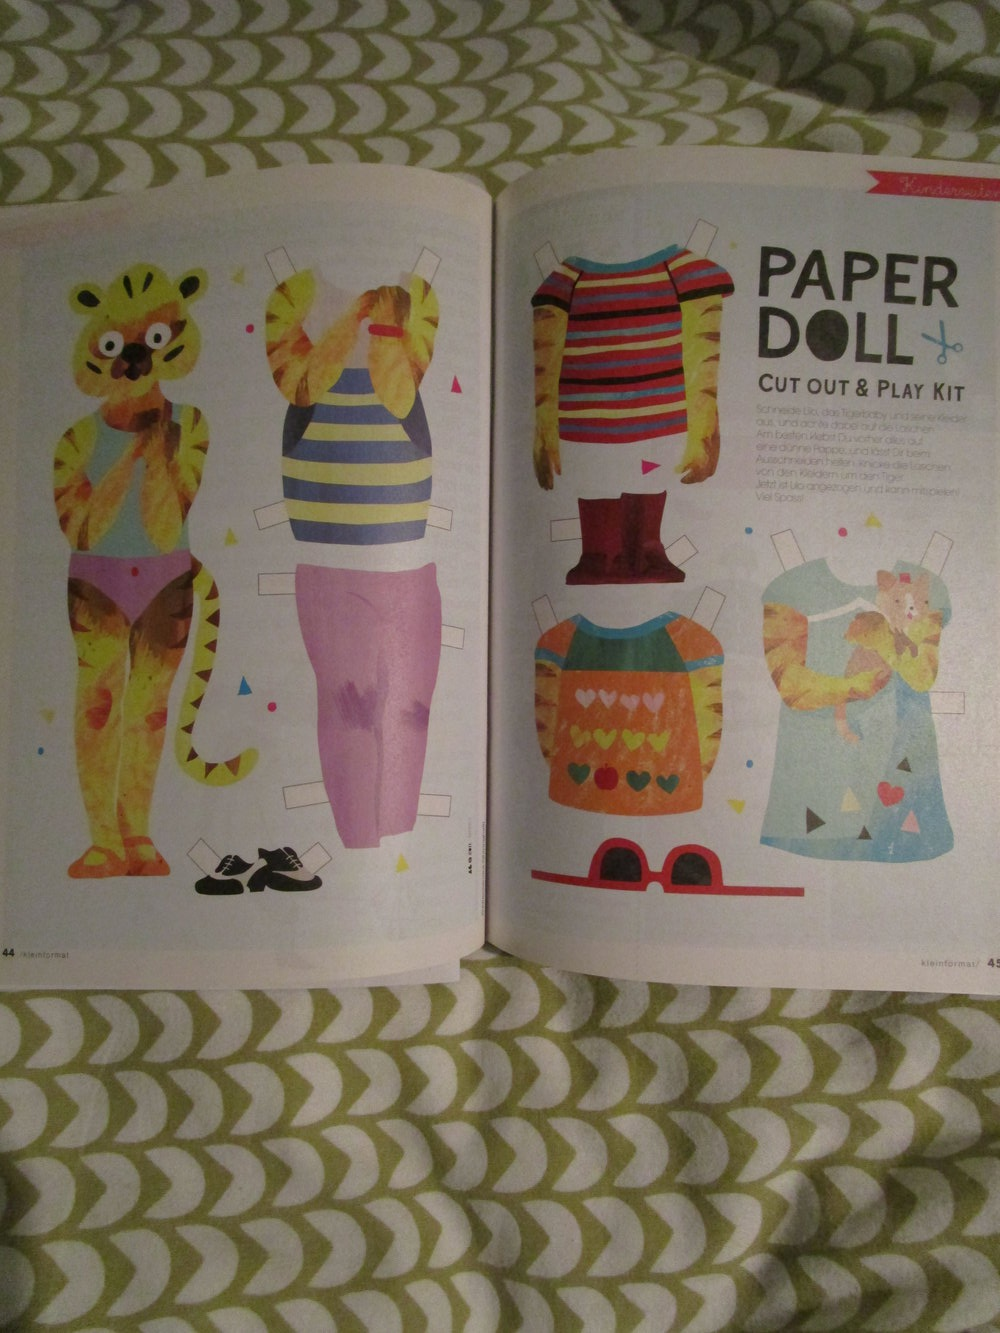 kleinformat 8 magazin zeitschrift kreative eltern diy kinder erziehung selbstgemacht hip basteln. Black Bedroom Furniture Sets. Home Design Ideas